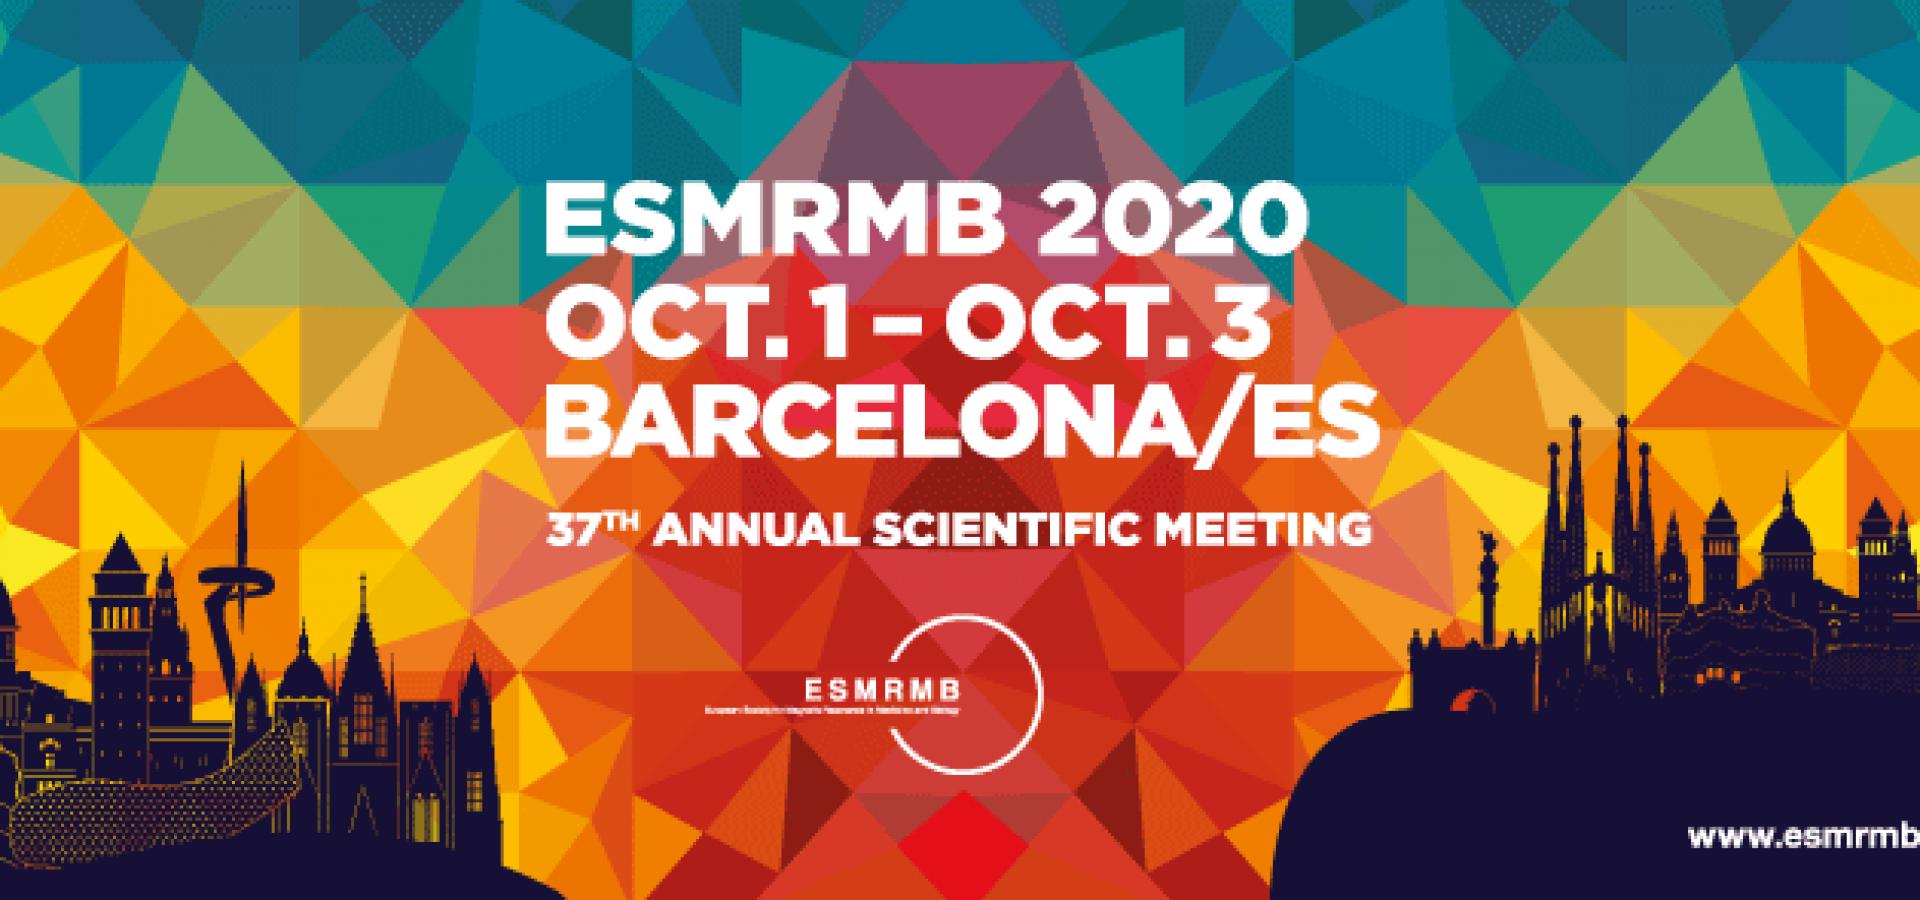 ESMRMB-Banners-700x295